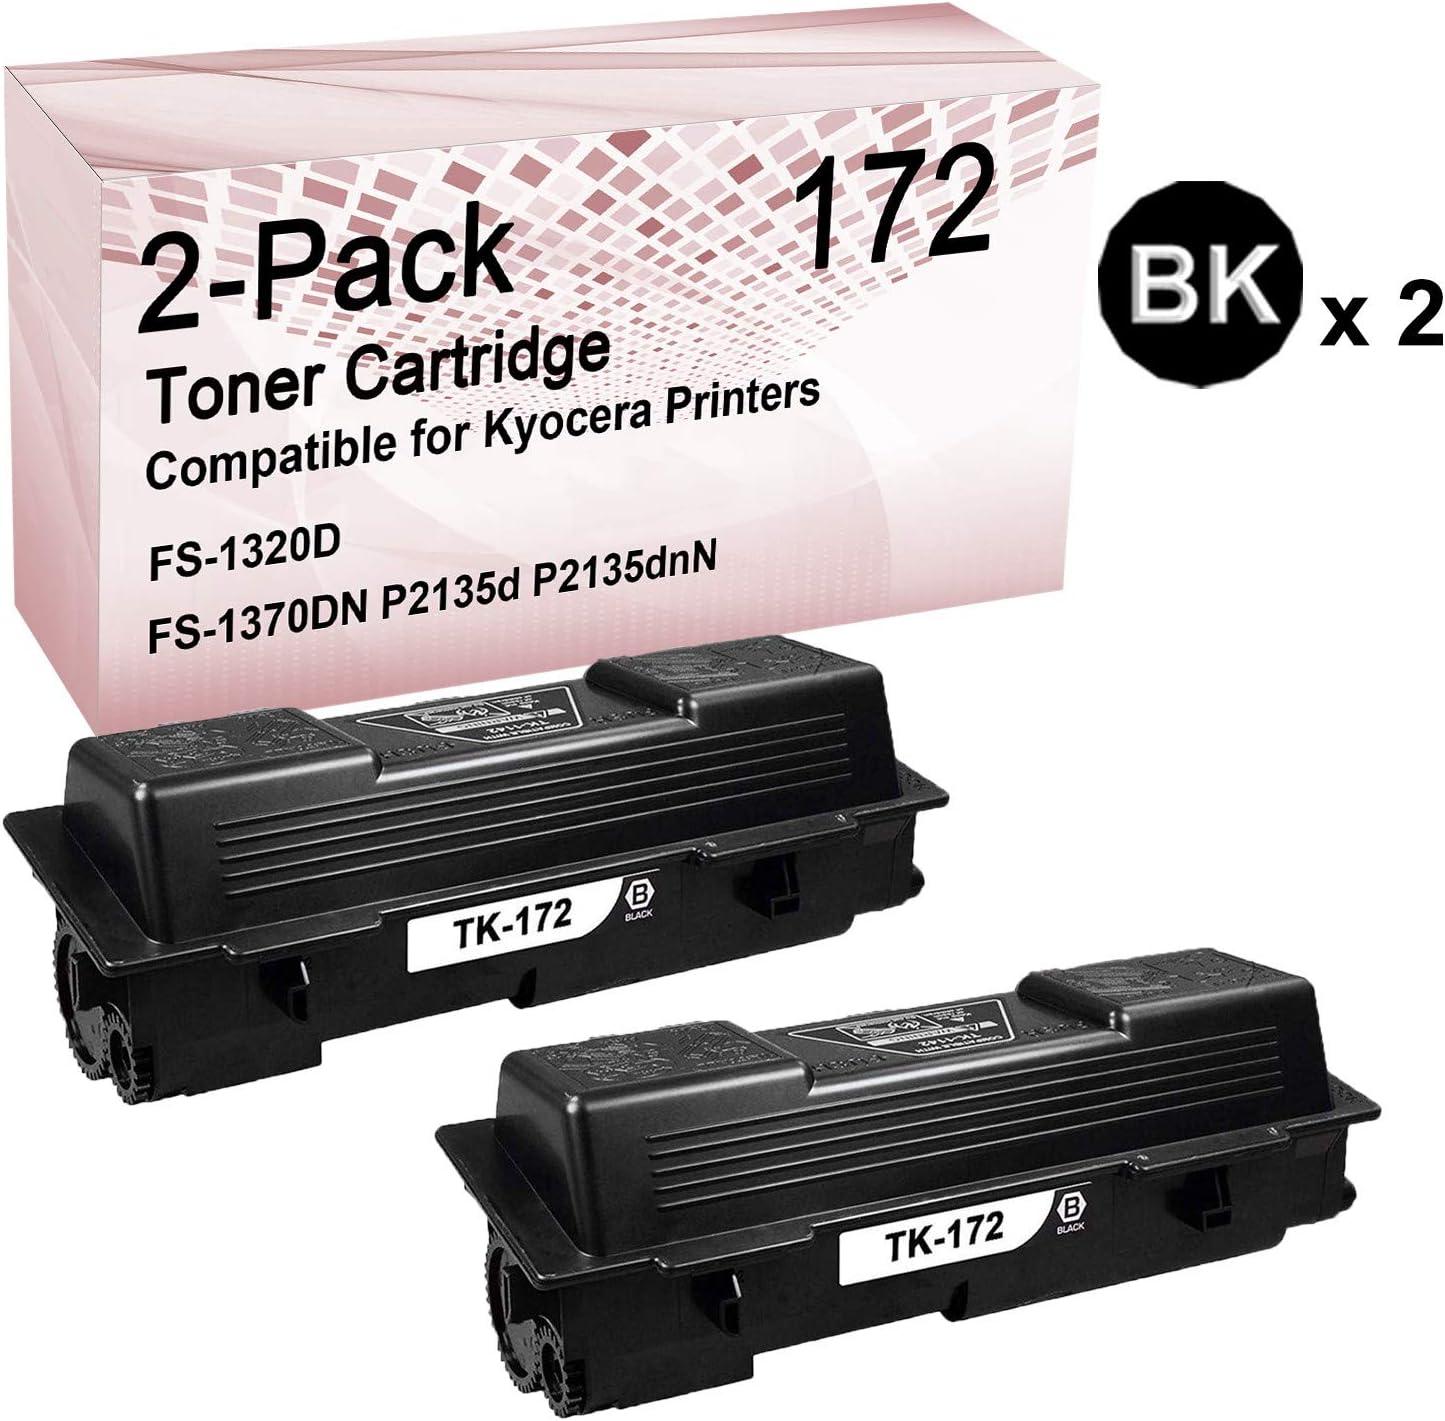 2-Pack (Black) Compatible High Yield 172 Imaging Toner Cartridge use for Kyocera Laser P2135d P2135dnN Printer